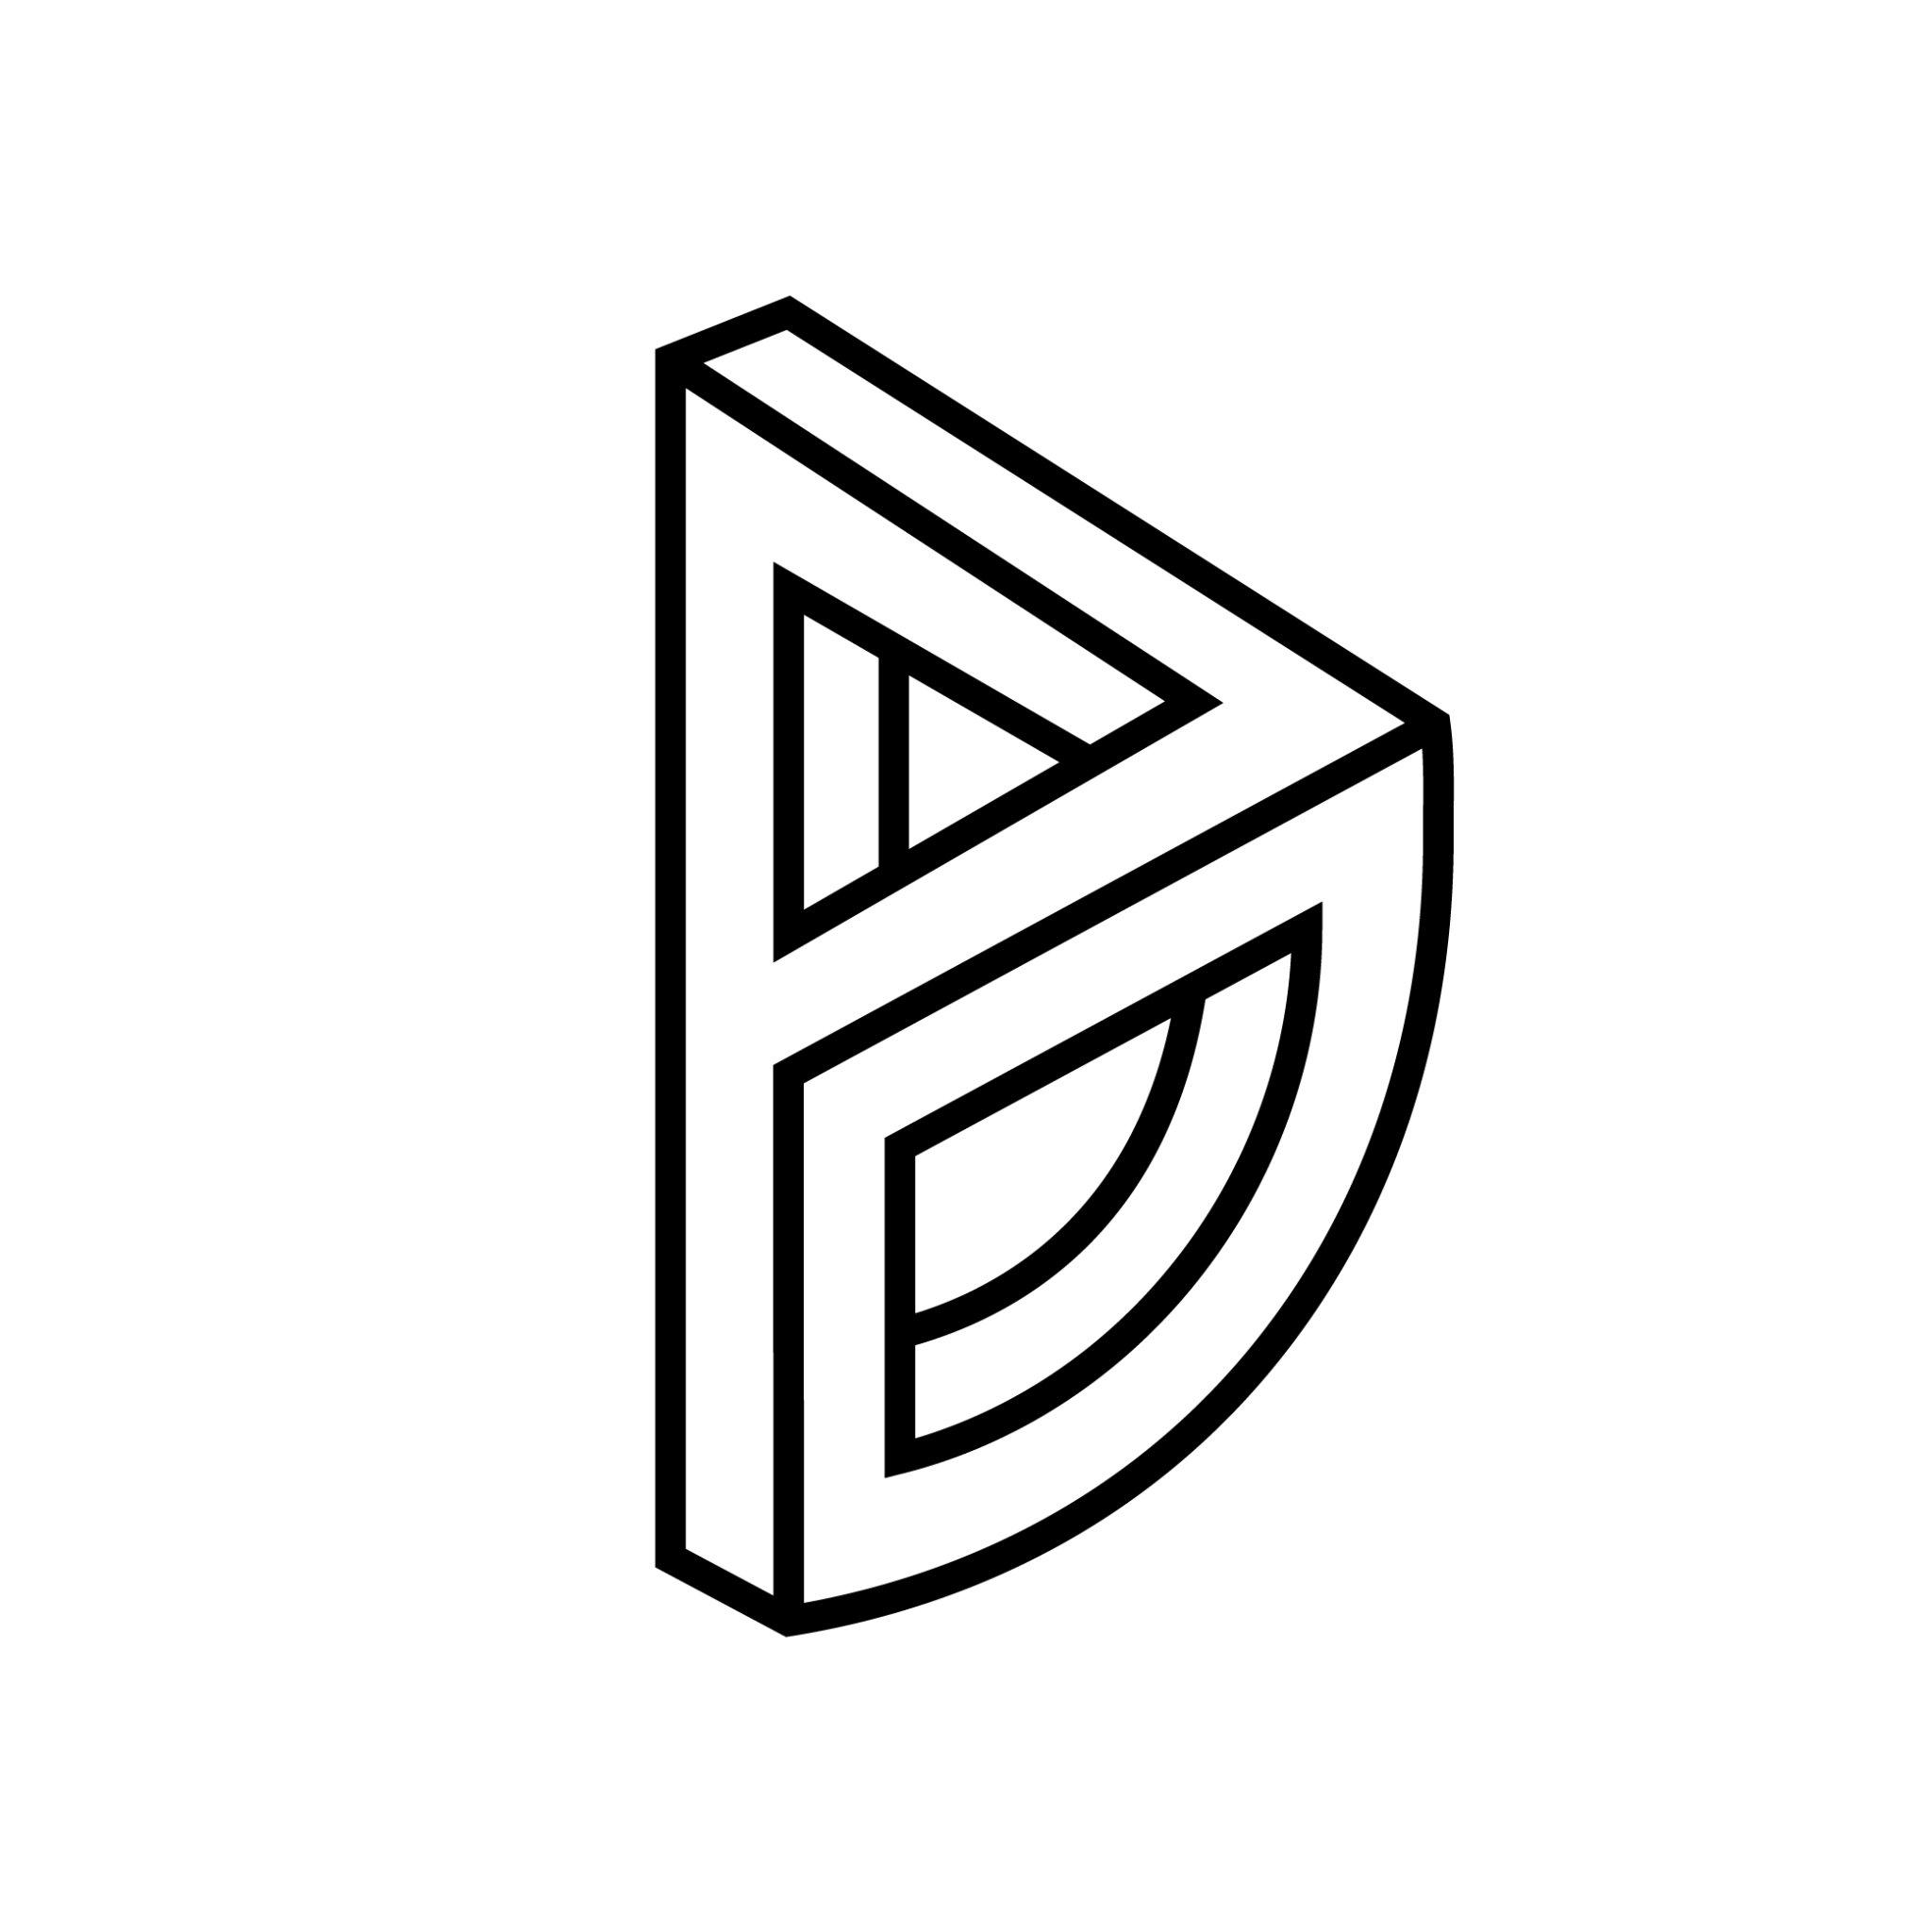 Digicel clipart foundation funding application form vector transparent stock Paradigm fund (@Paradigm_fund) | Twitter vector transparent stock